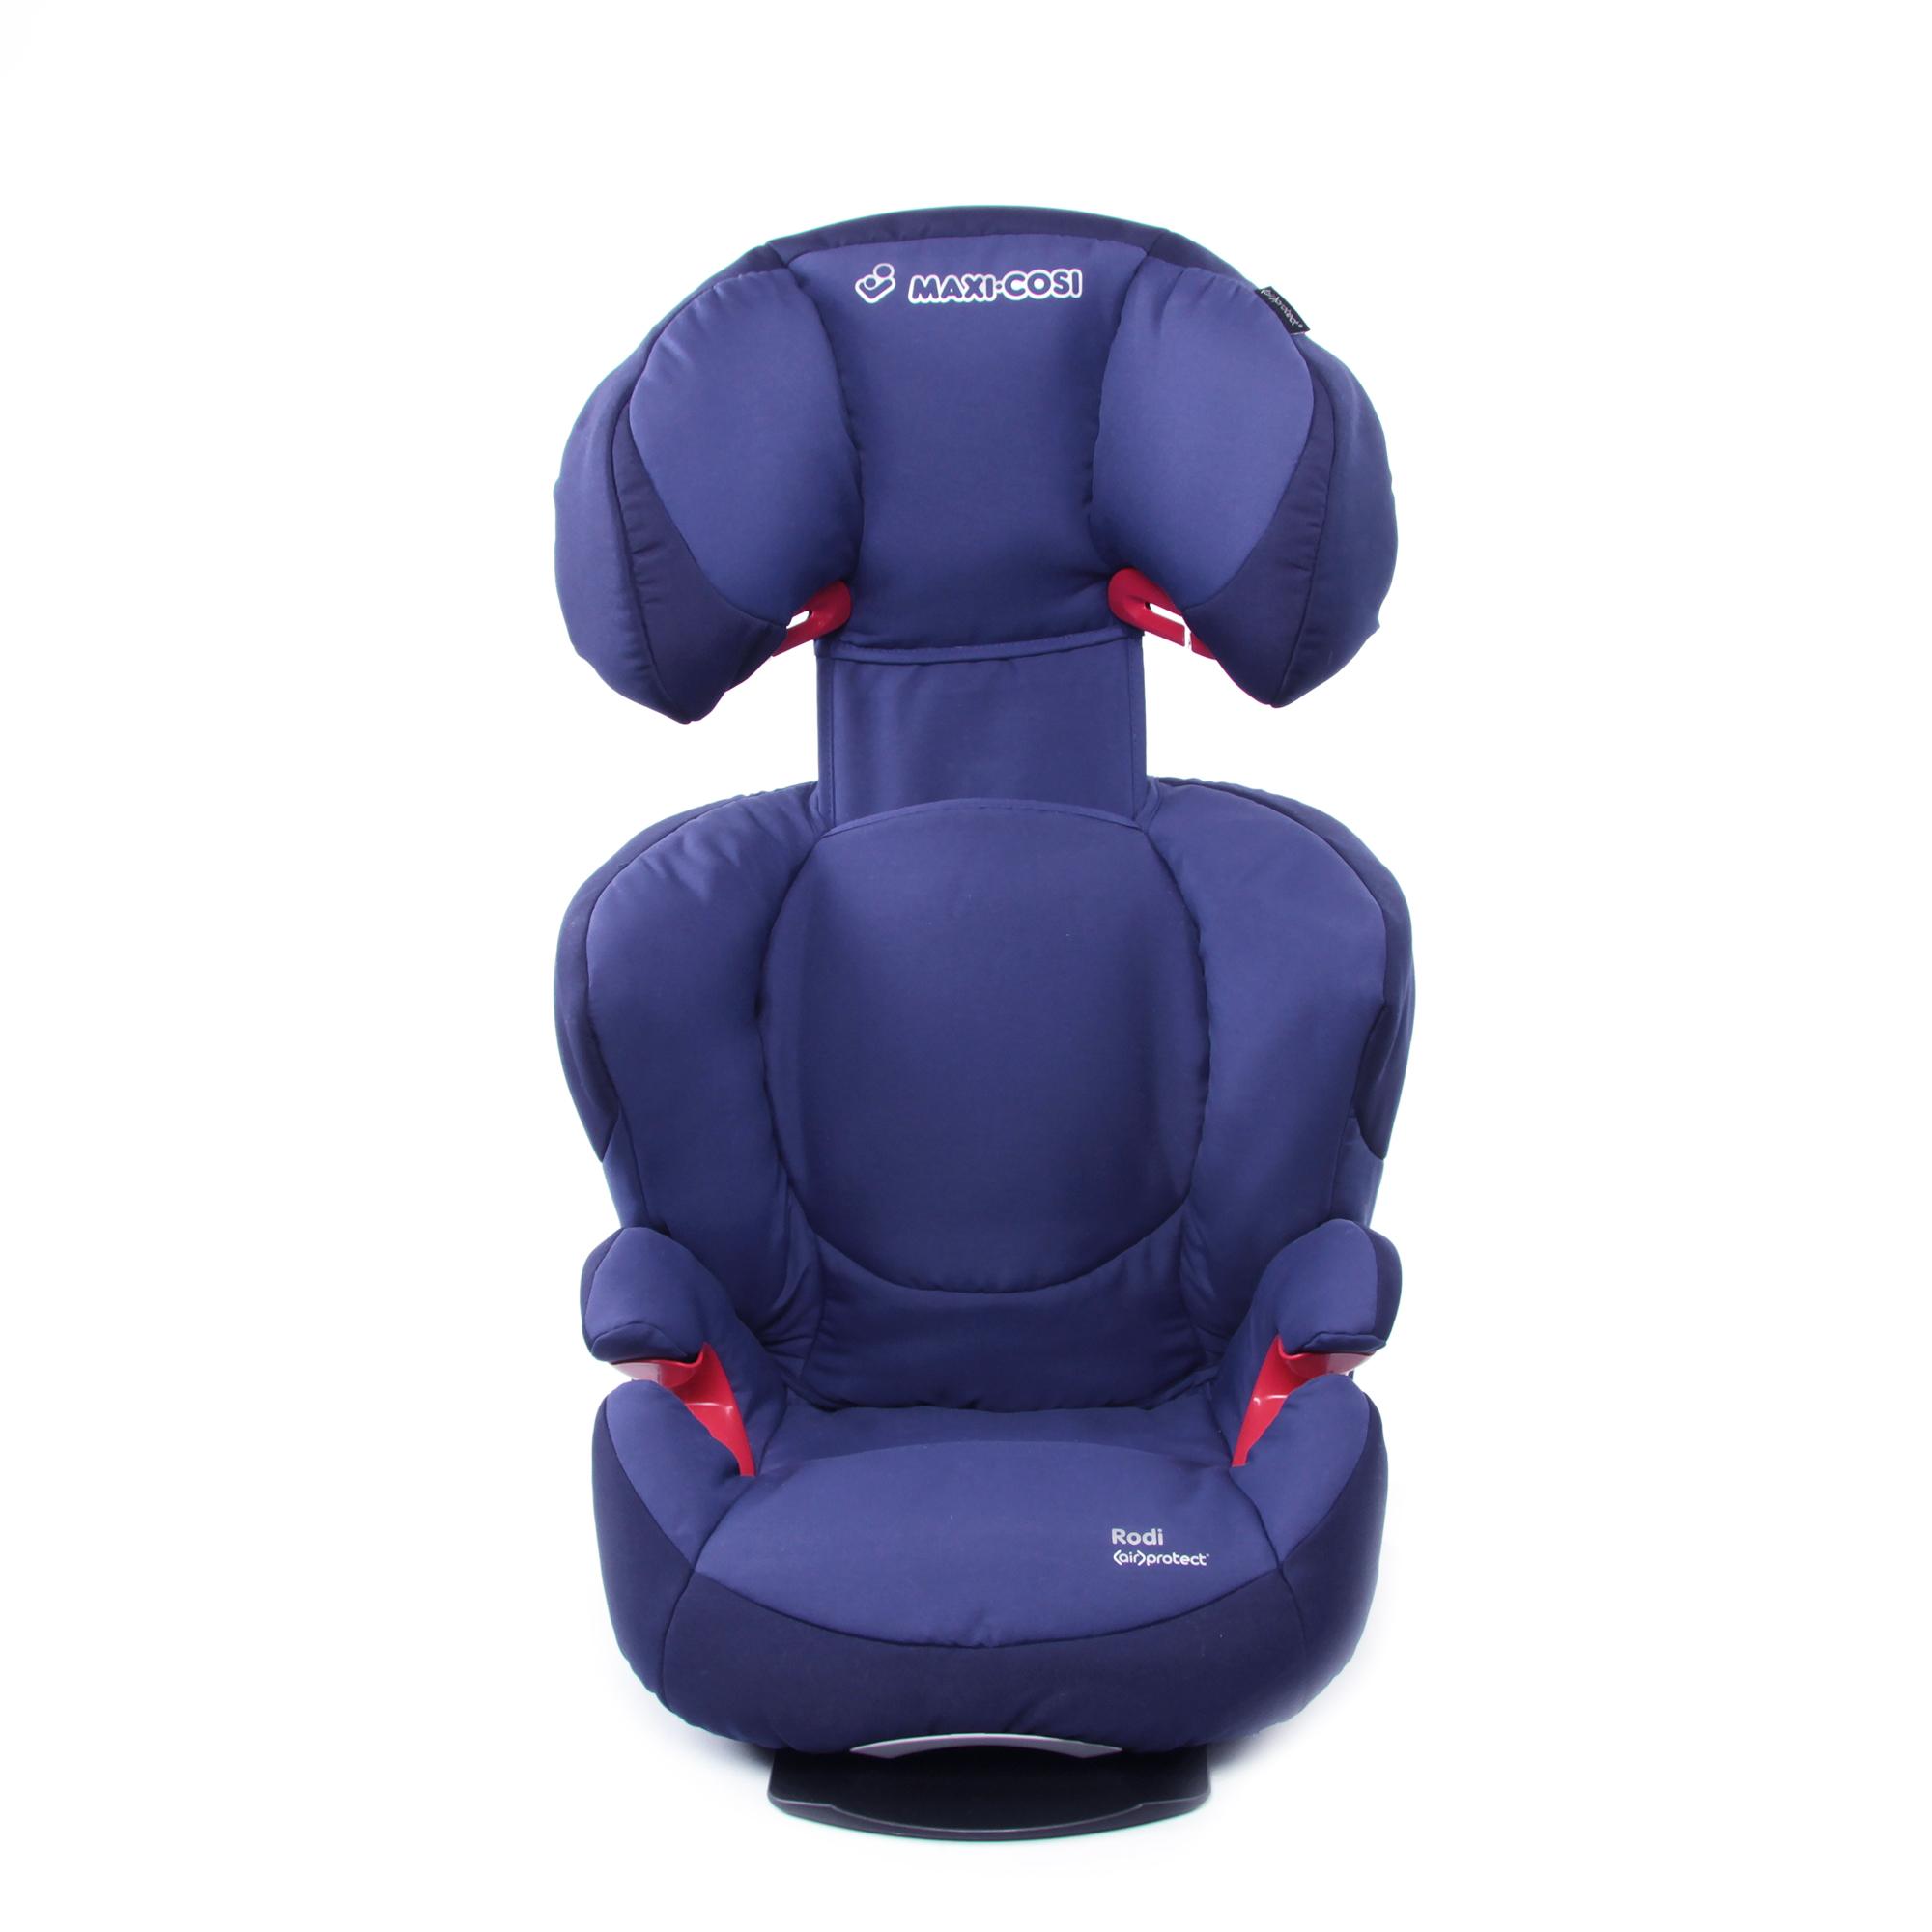 maxi cosi child car seat rodi air protect 2017 river blue buy at kidsroom car seats. Black Bedroom Furniture Sets. Home Design Ideas